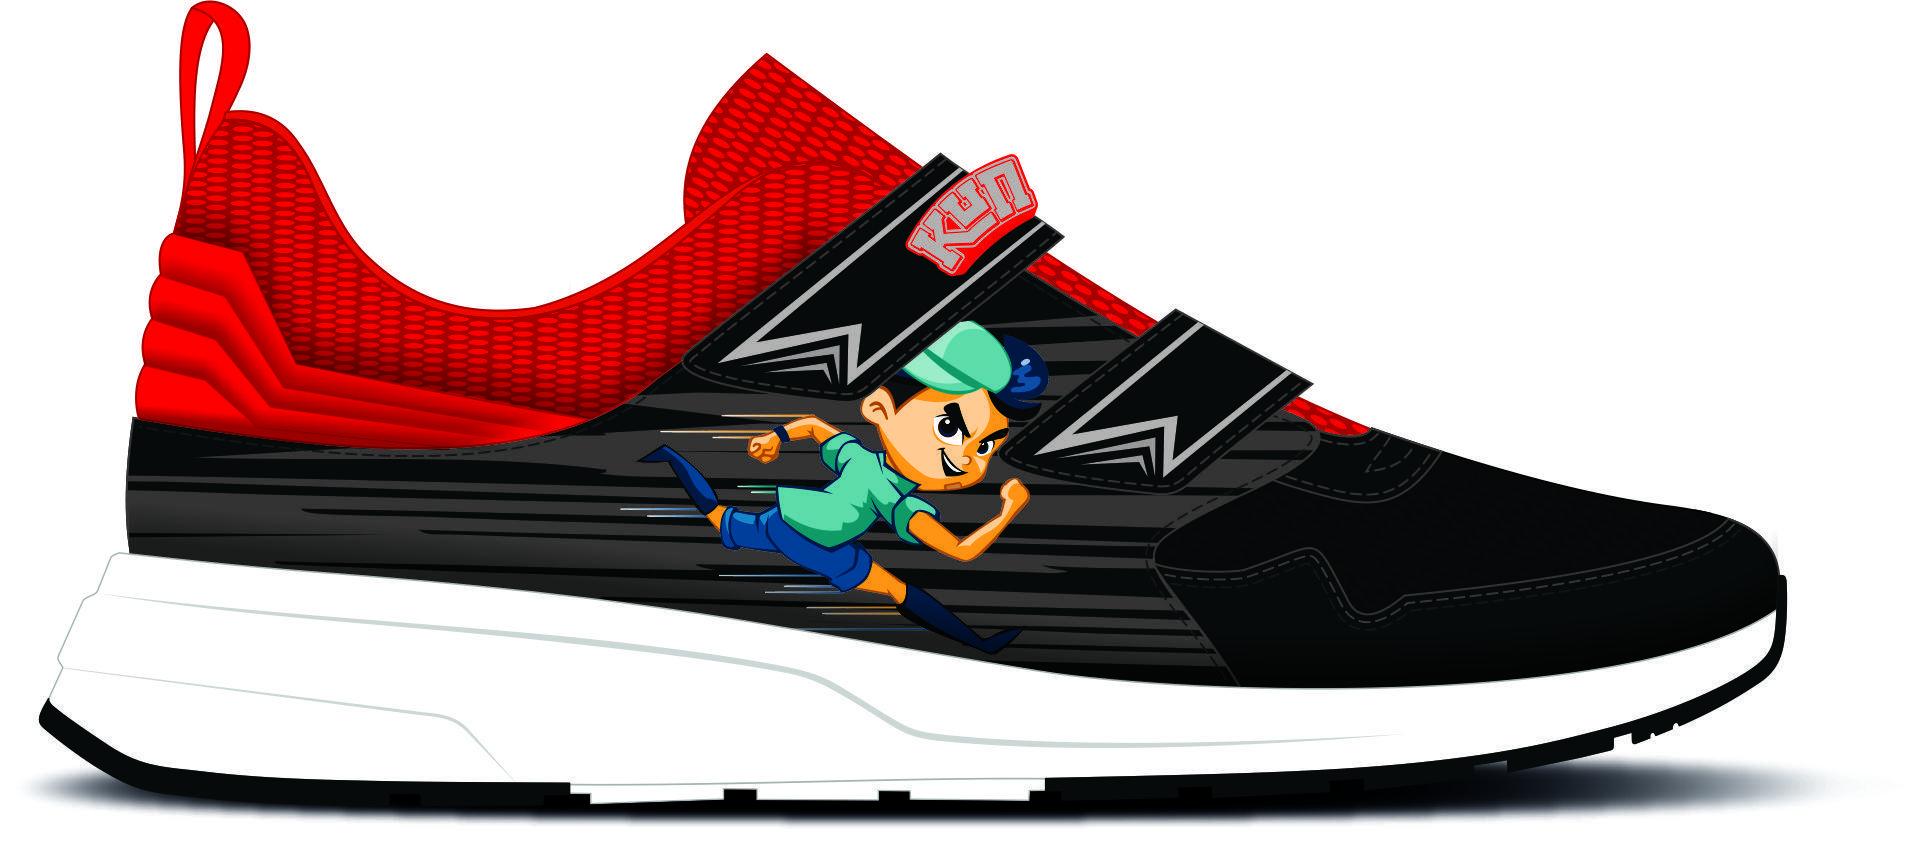 3. Giày CC đỏ đen